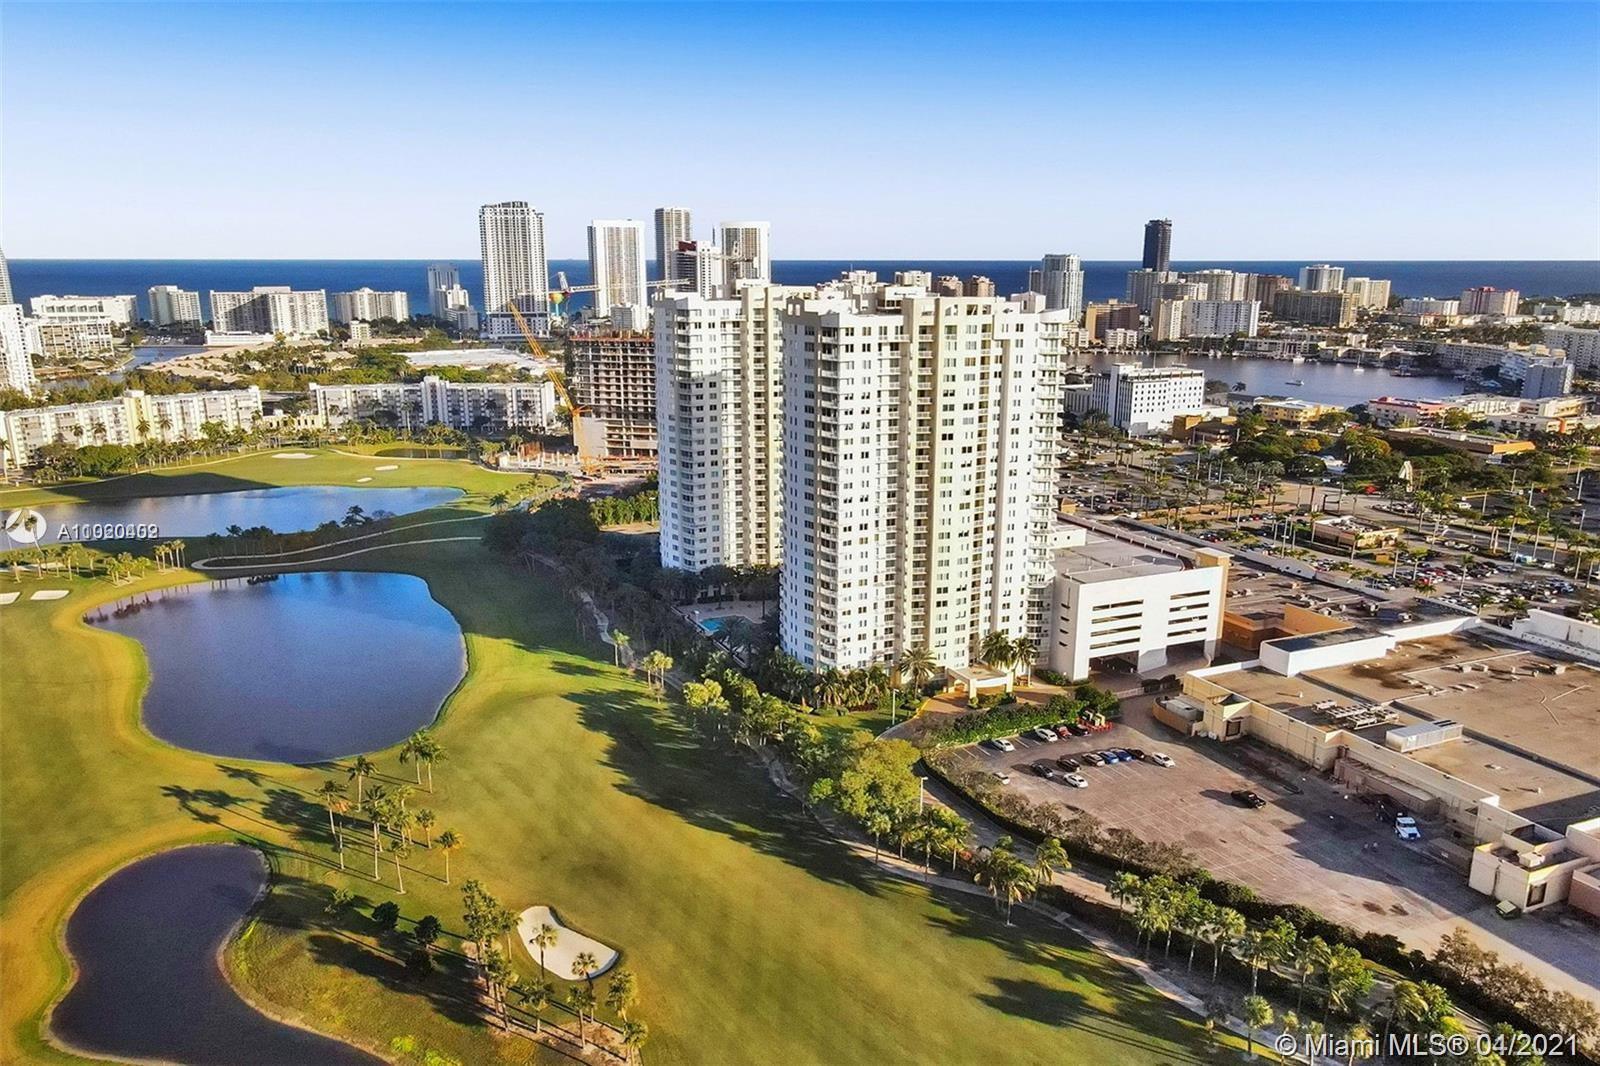 TURN-KEY apt with breathtaking Golf Course, Lake, Ocean & Pool Views from Wrap Around Balcony. Terri